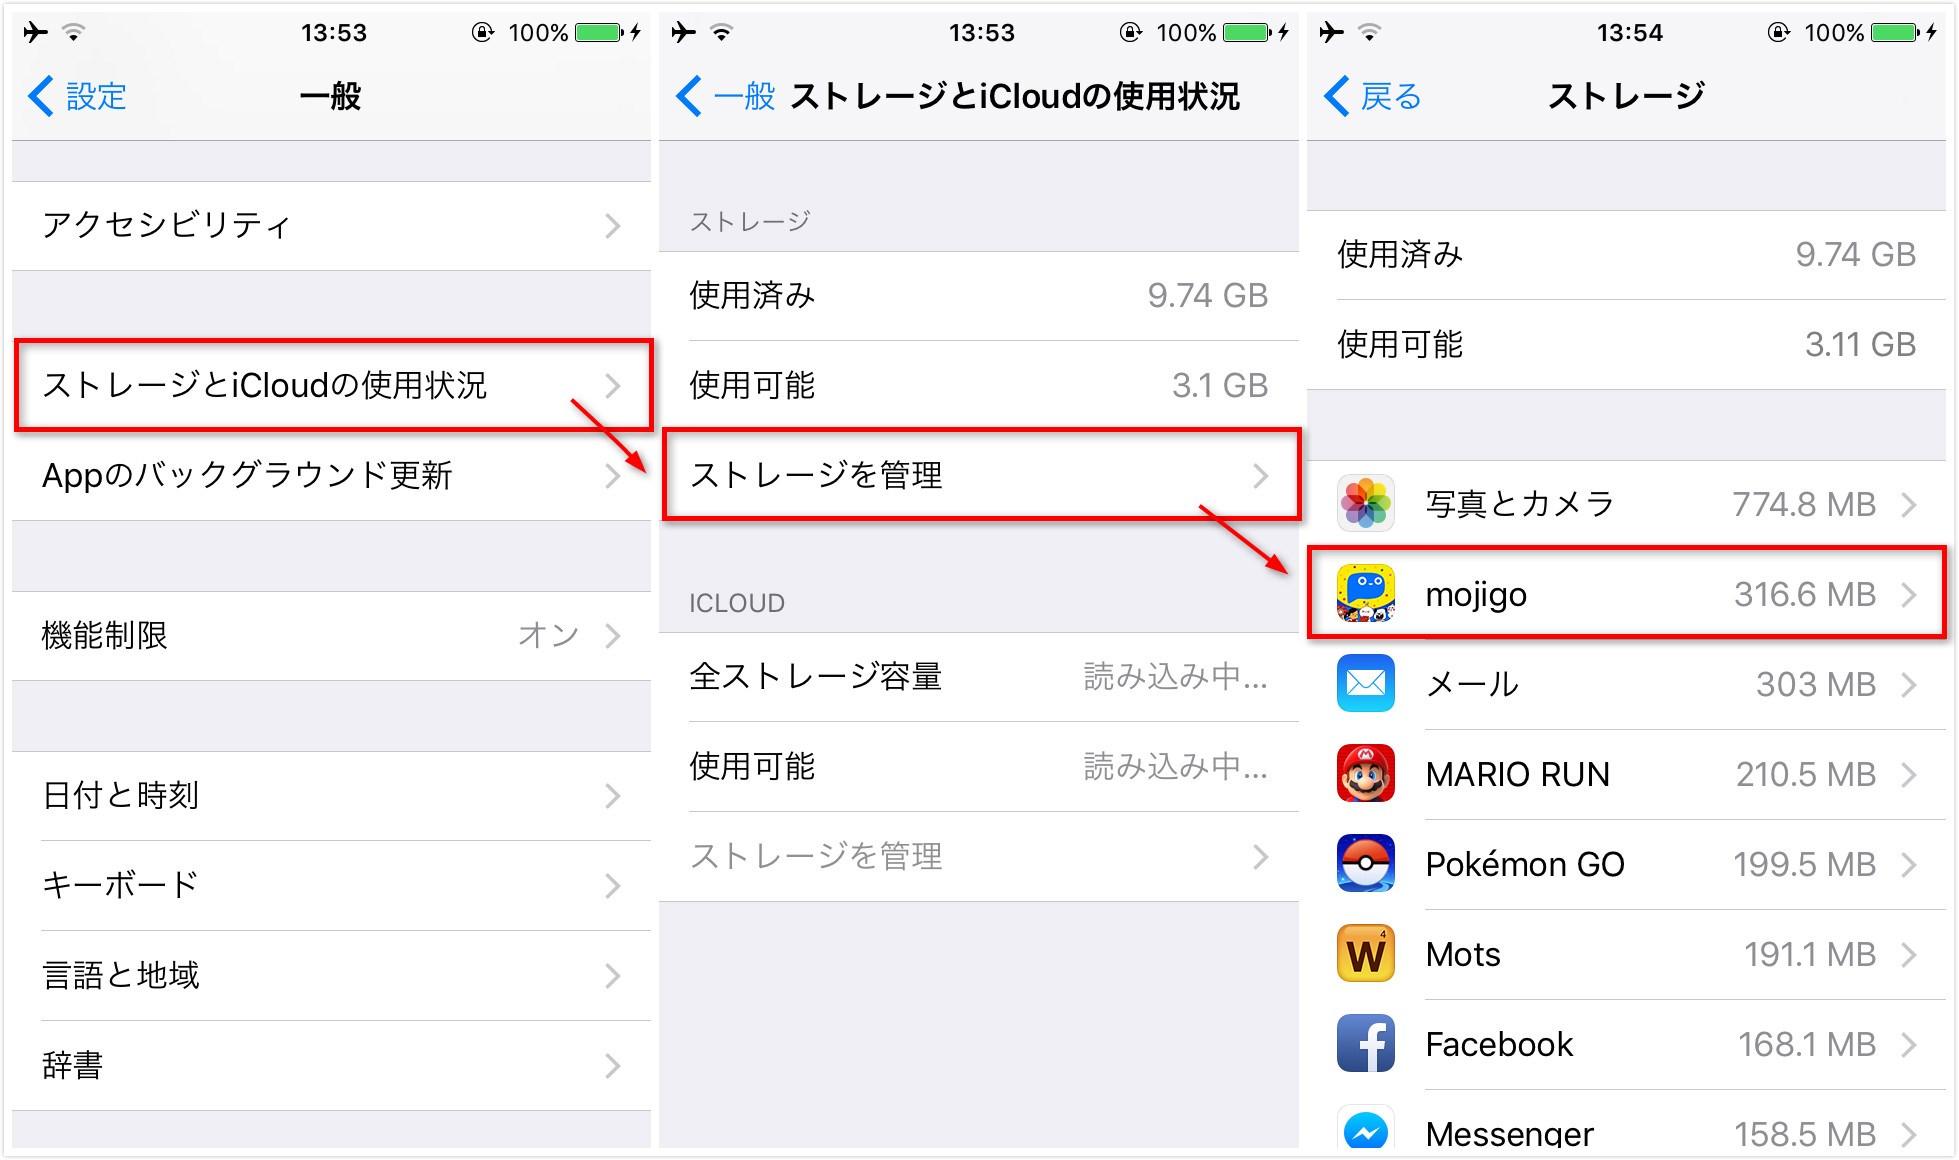 iOS 12.3・iOS 12.2・iOS 12.1・iOS 12アップデートによる不具合・バグ - iOS 12.3・iOS 12.2・iOS 12.1・iOS 12にした後iPhone動作が重い